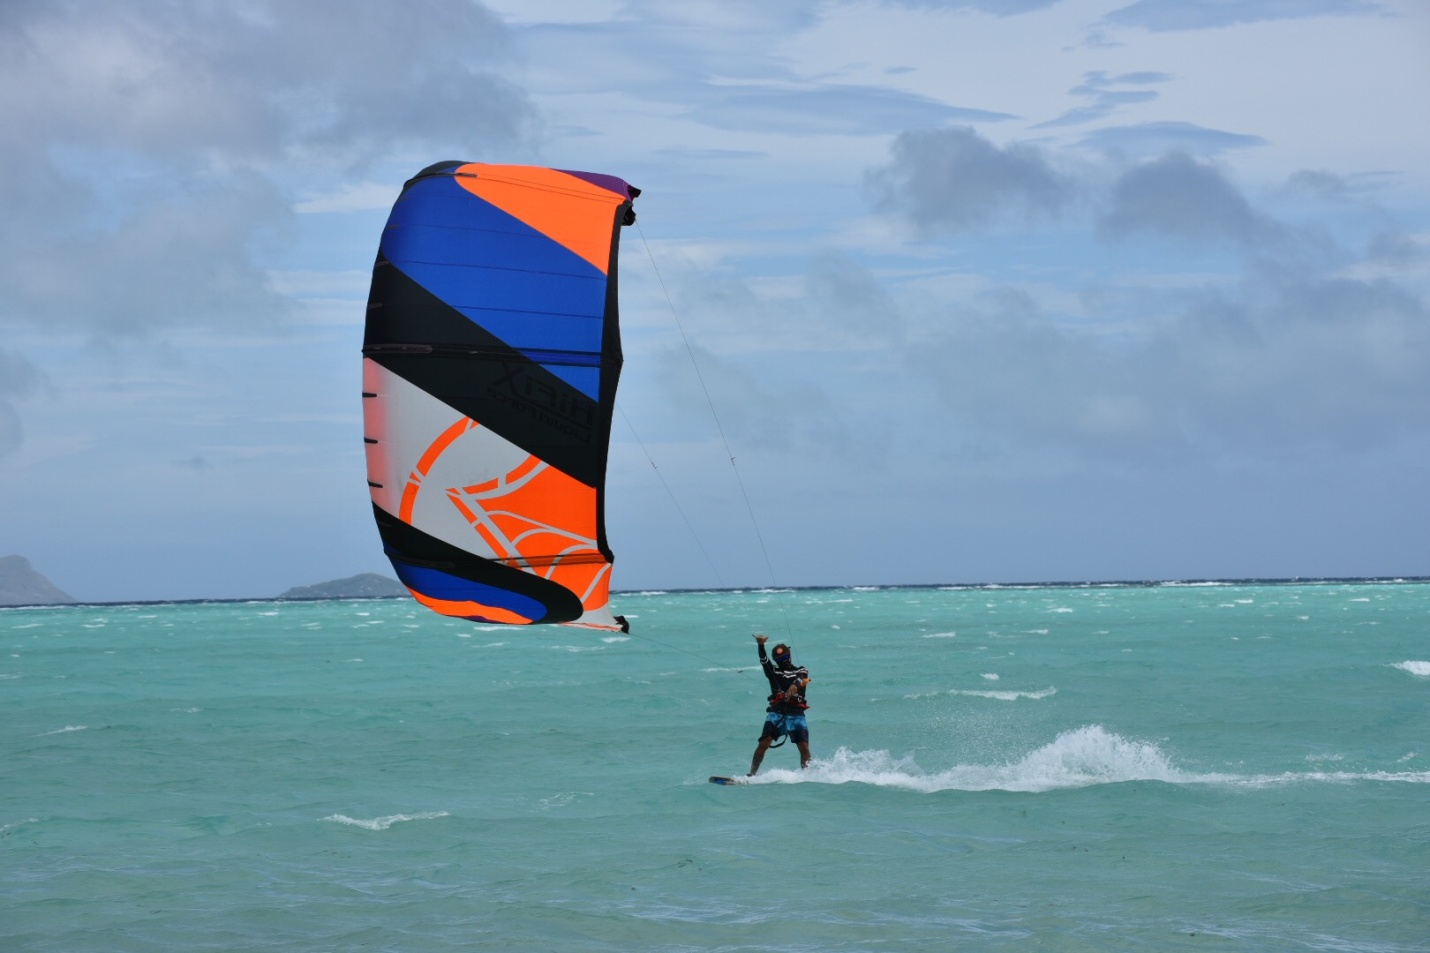 Miami Beach Sports and Recreation